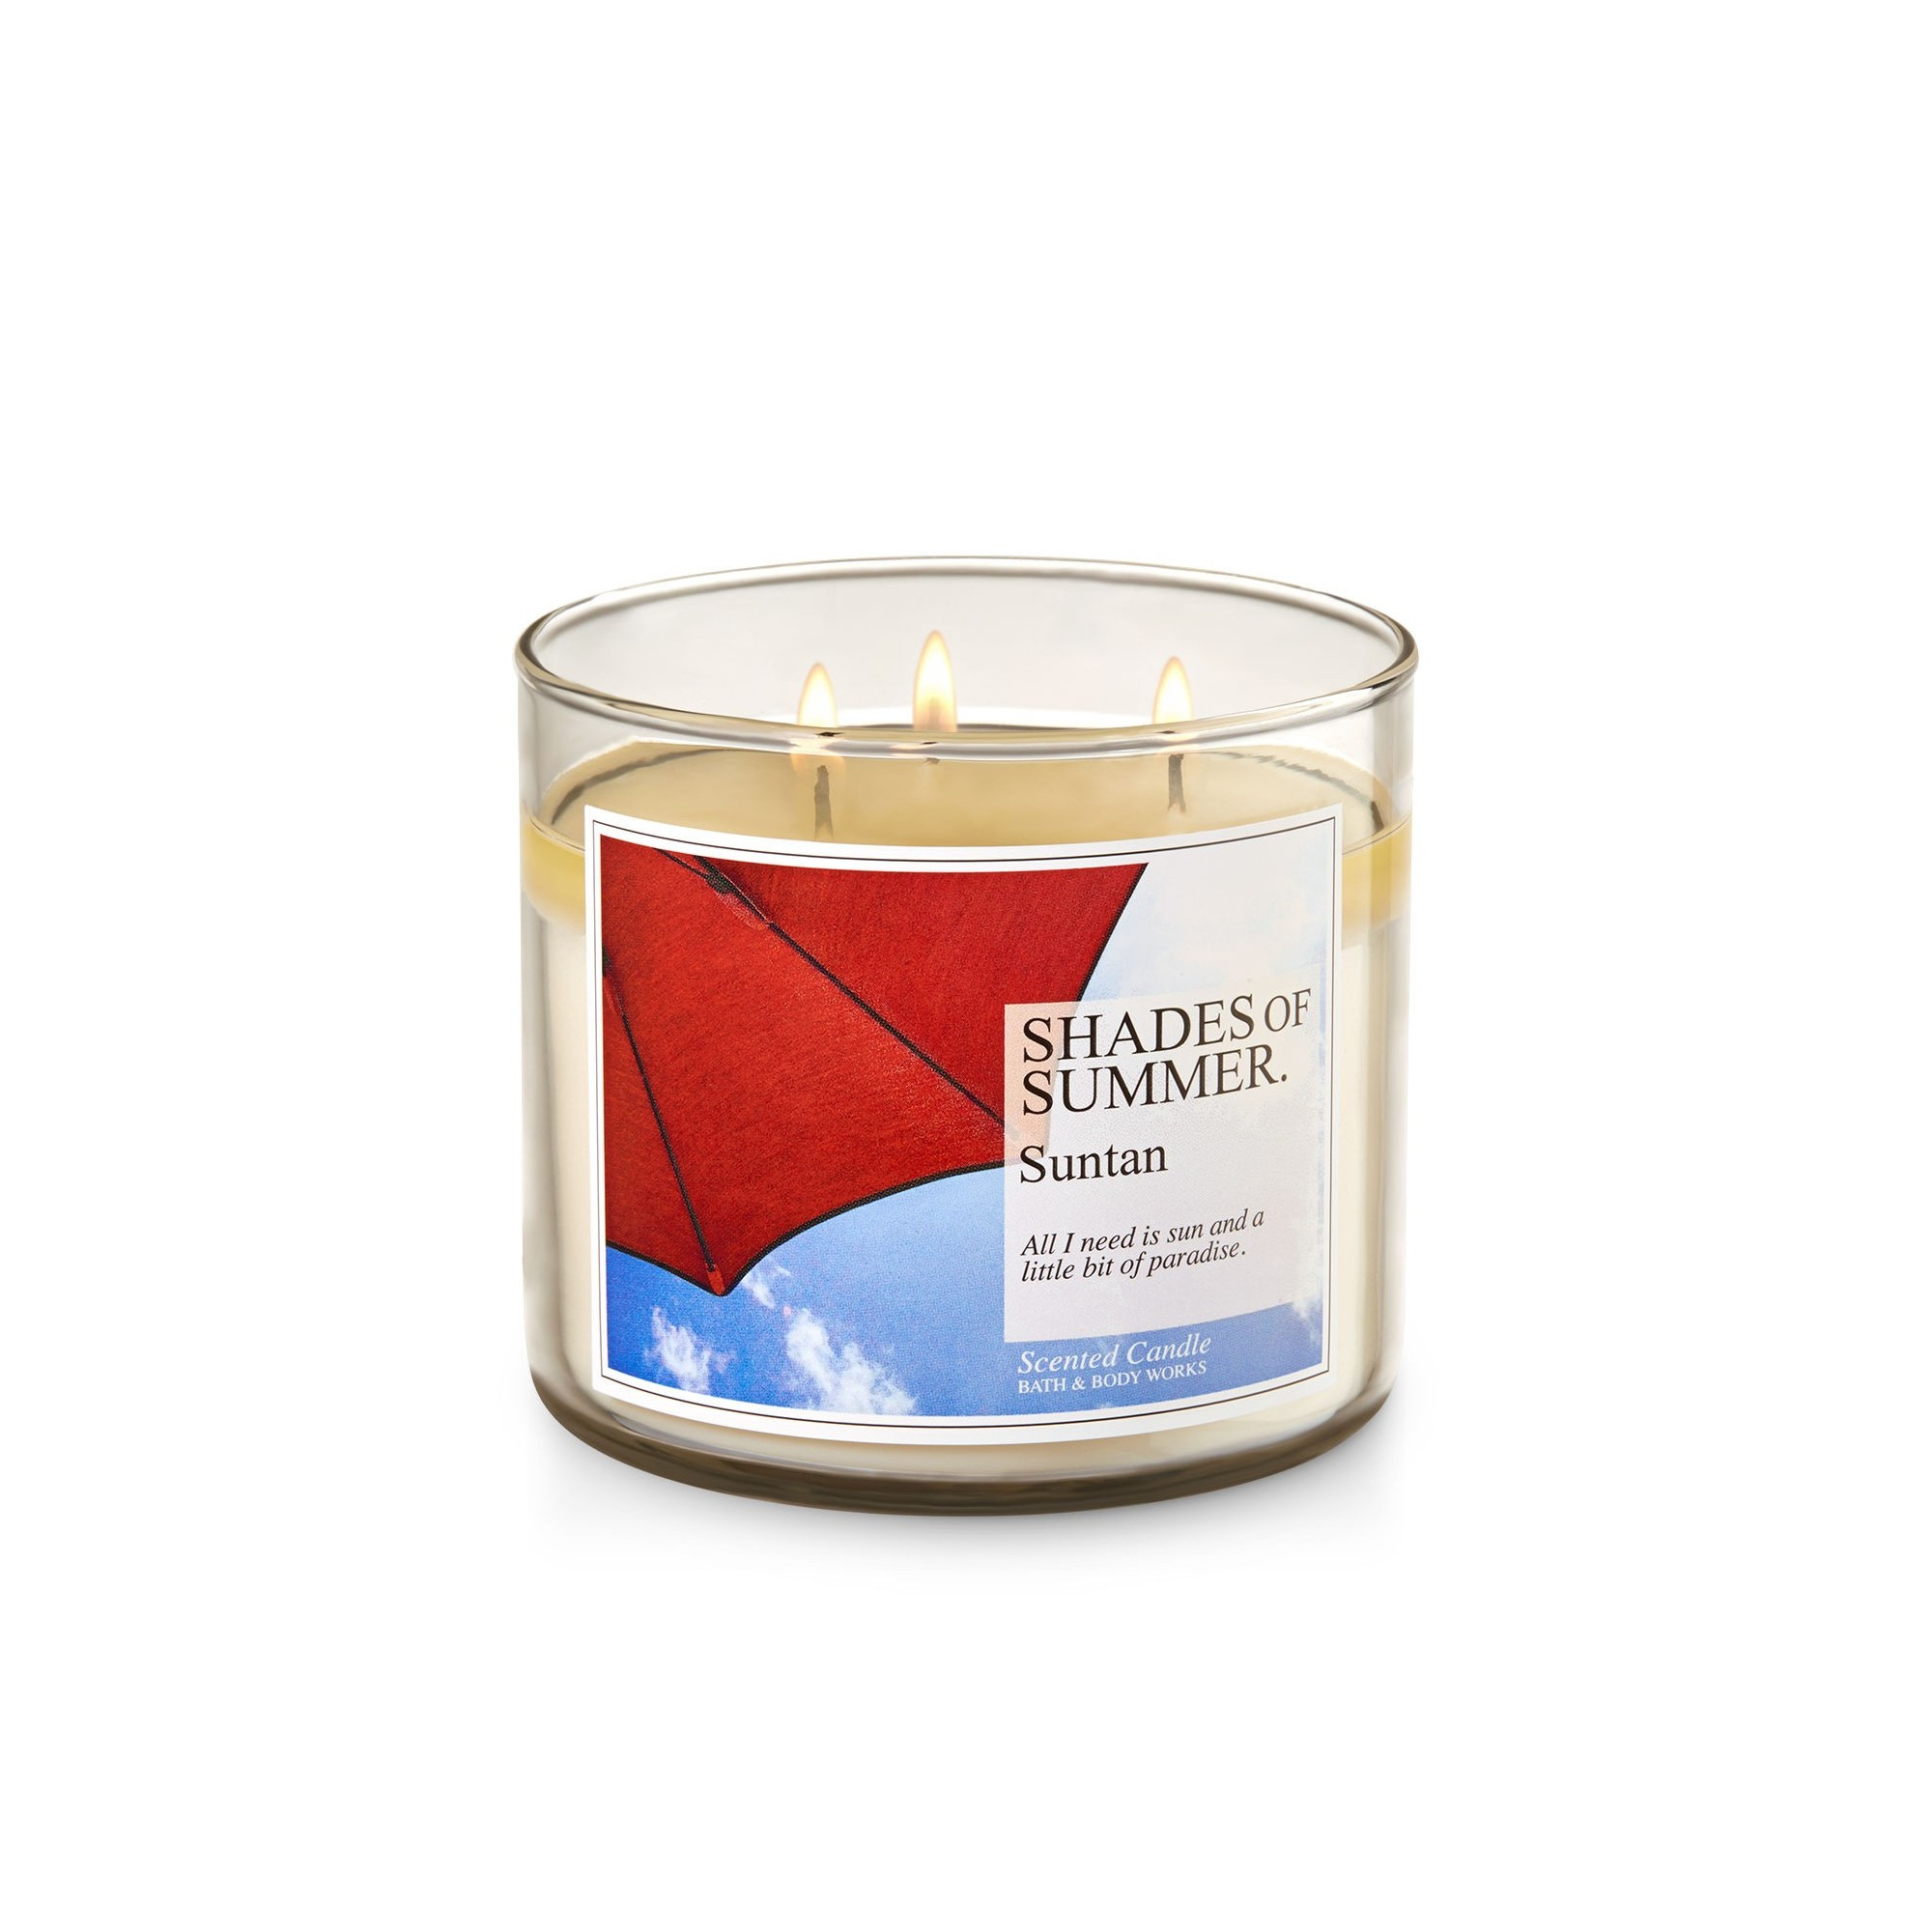 Bath & Body Works Suntan 3 Wick Scented Candle